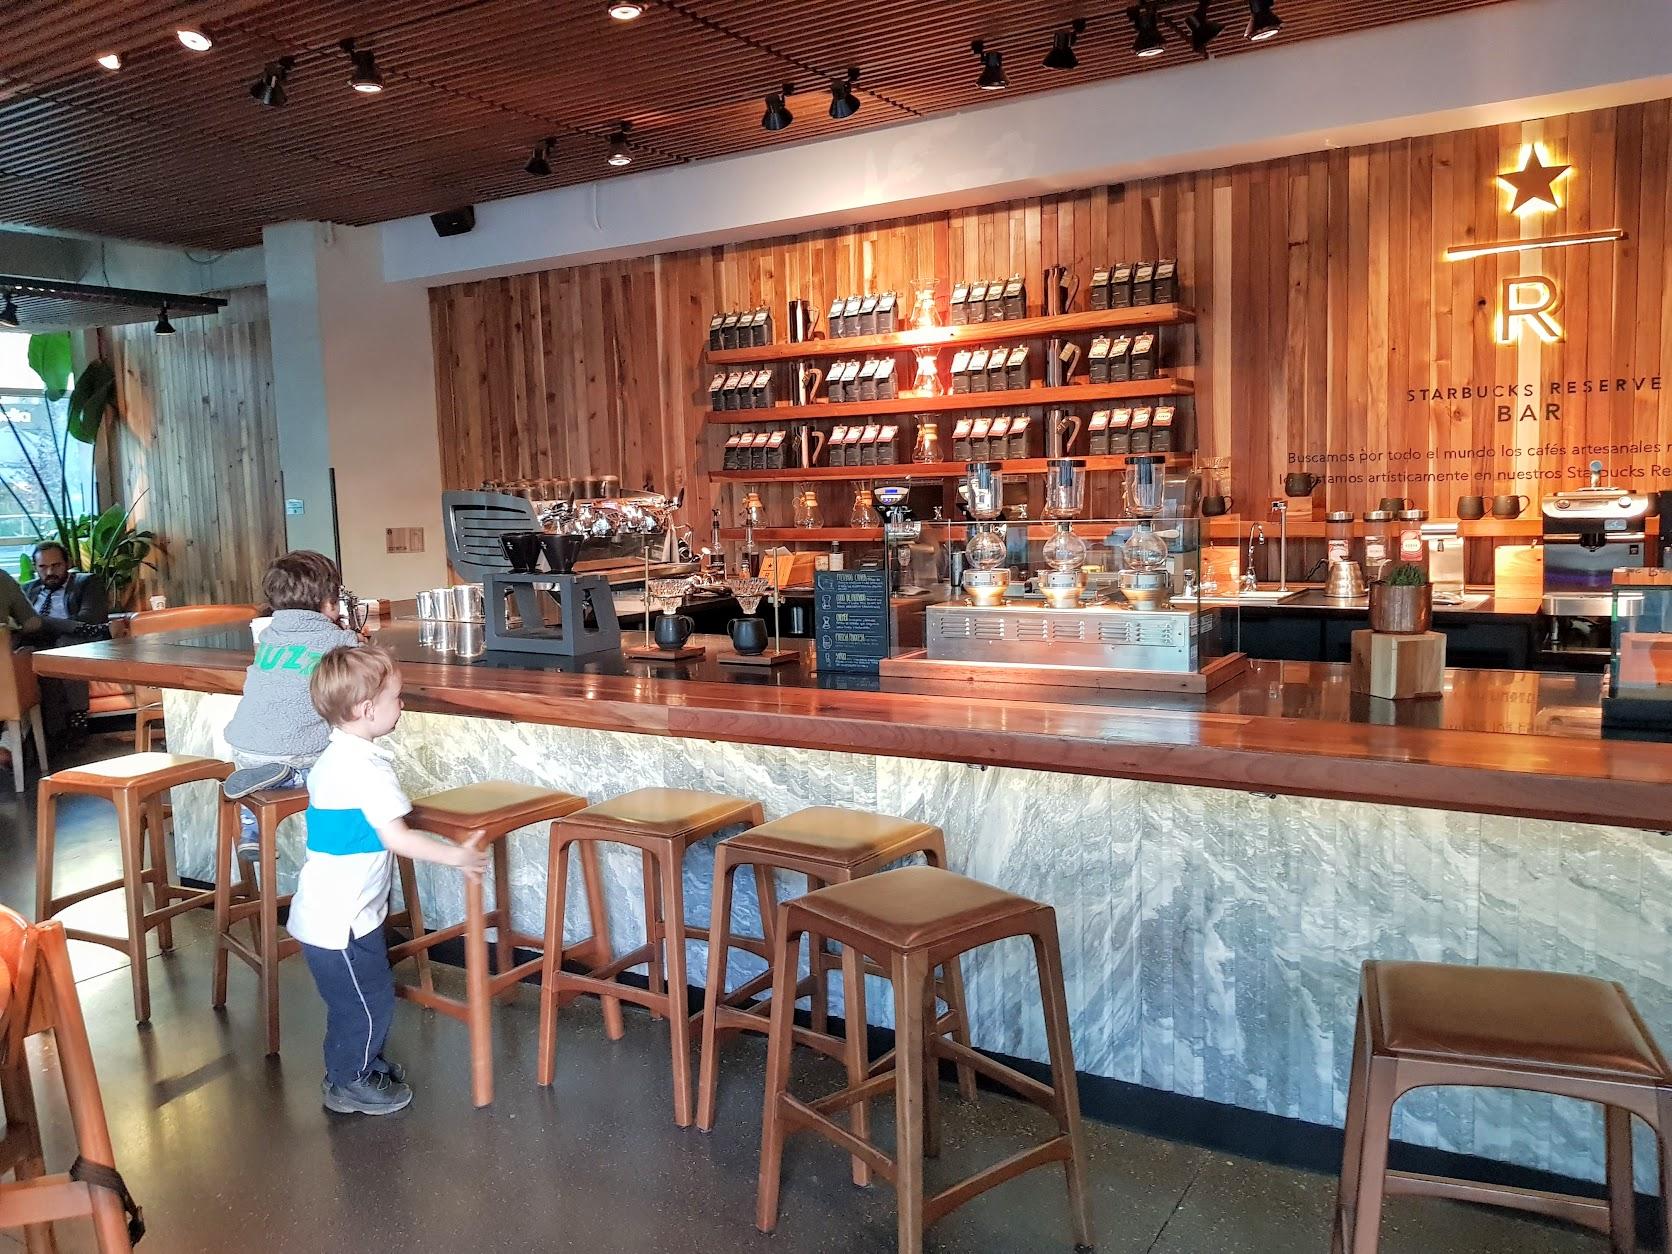 Starbucks Reserve Santiago